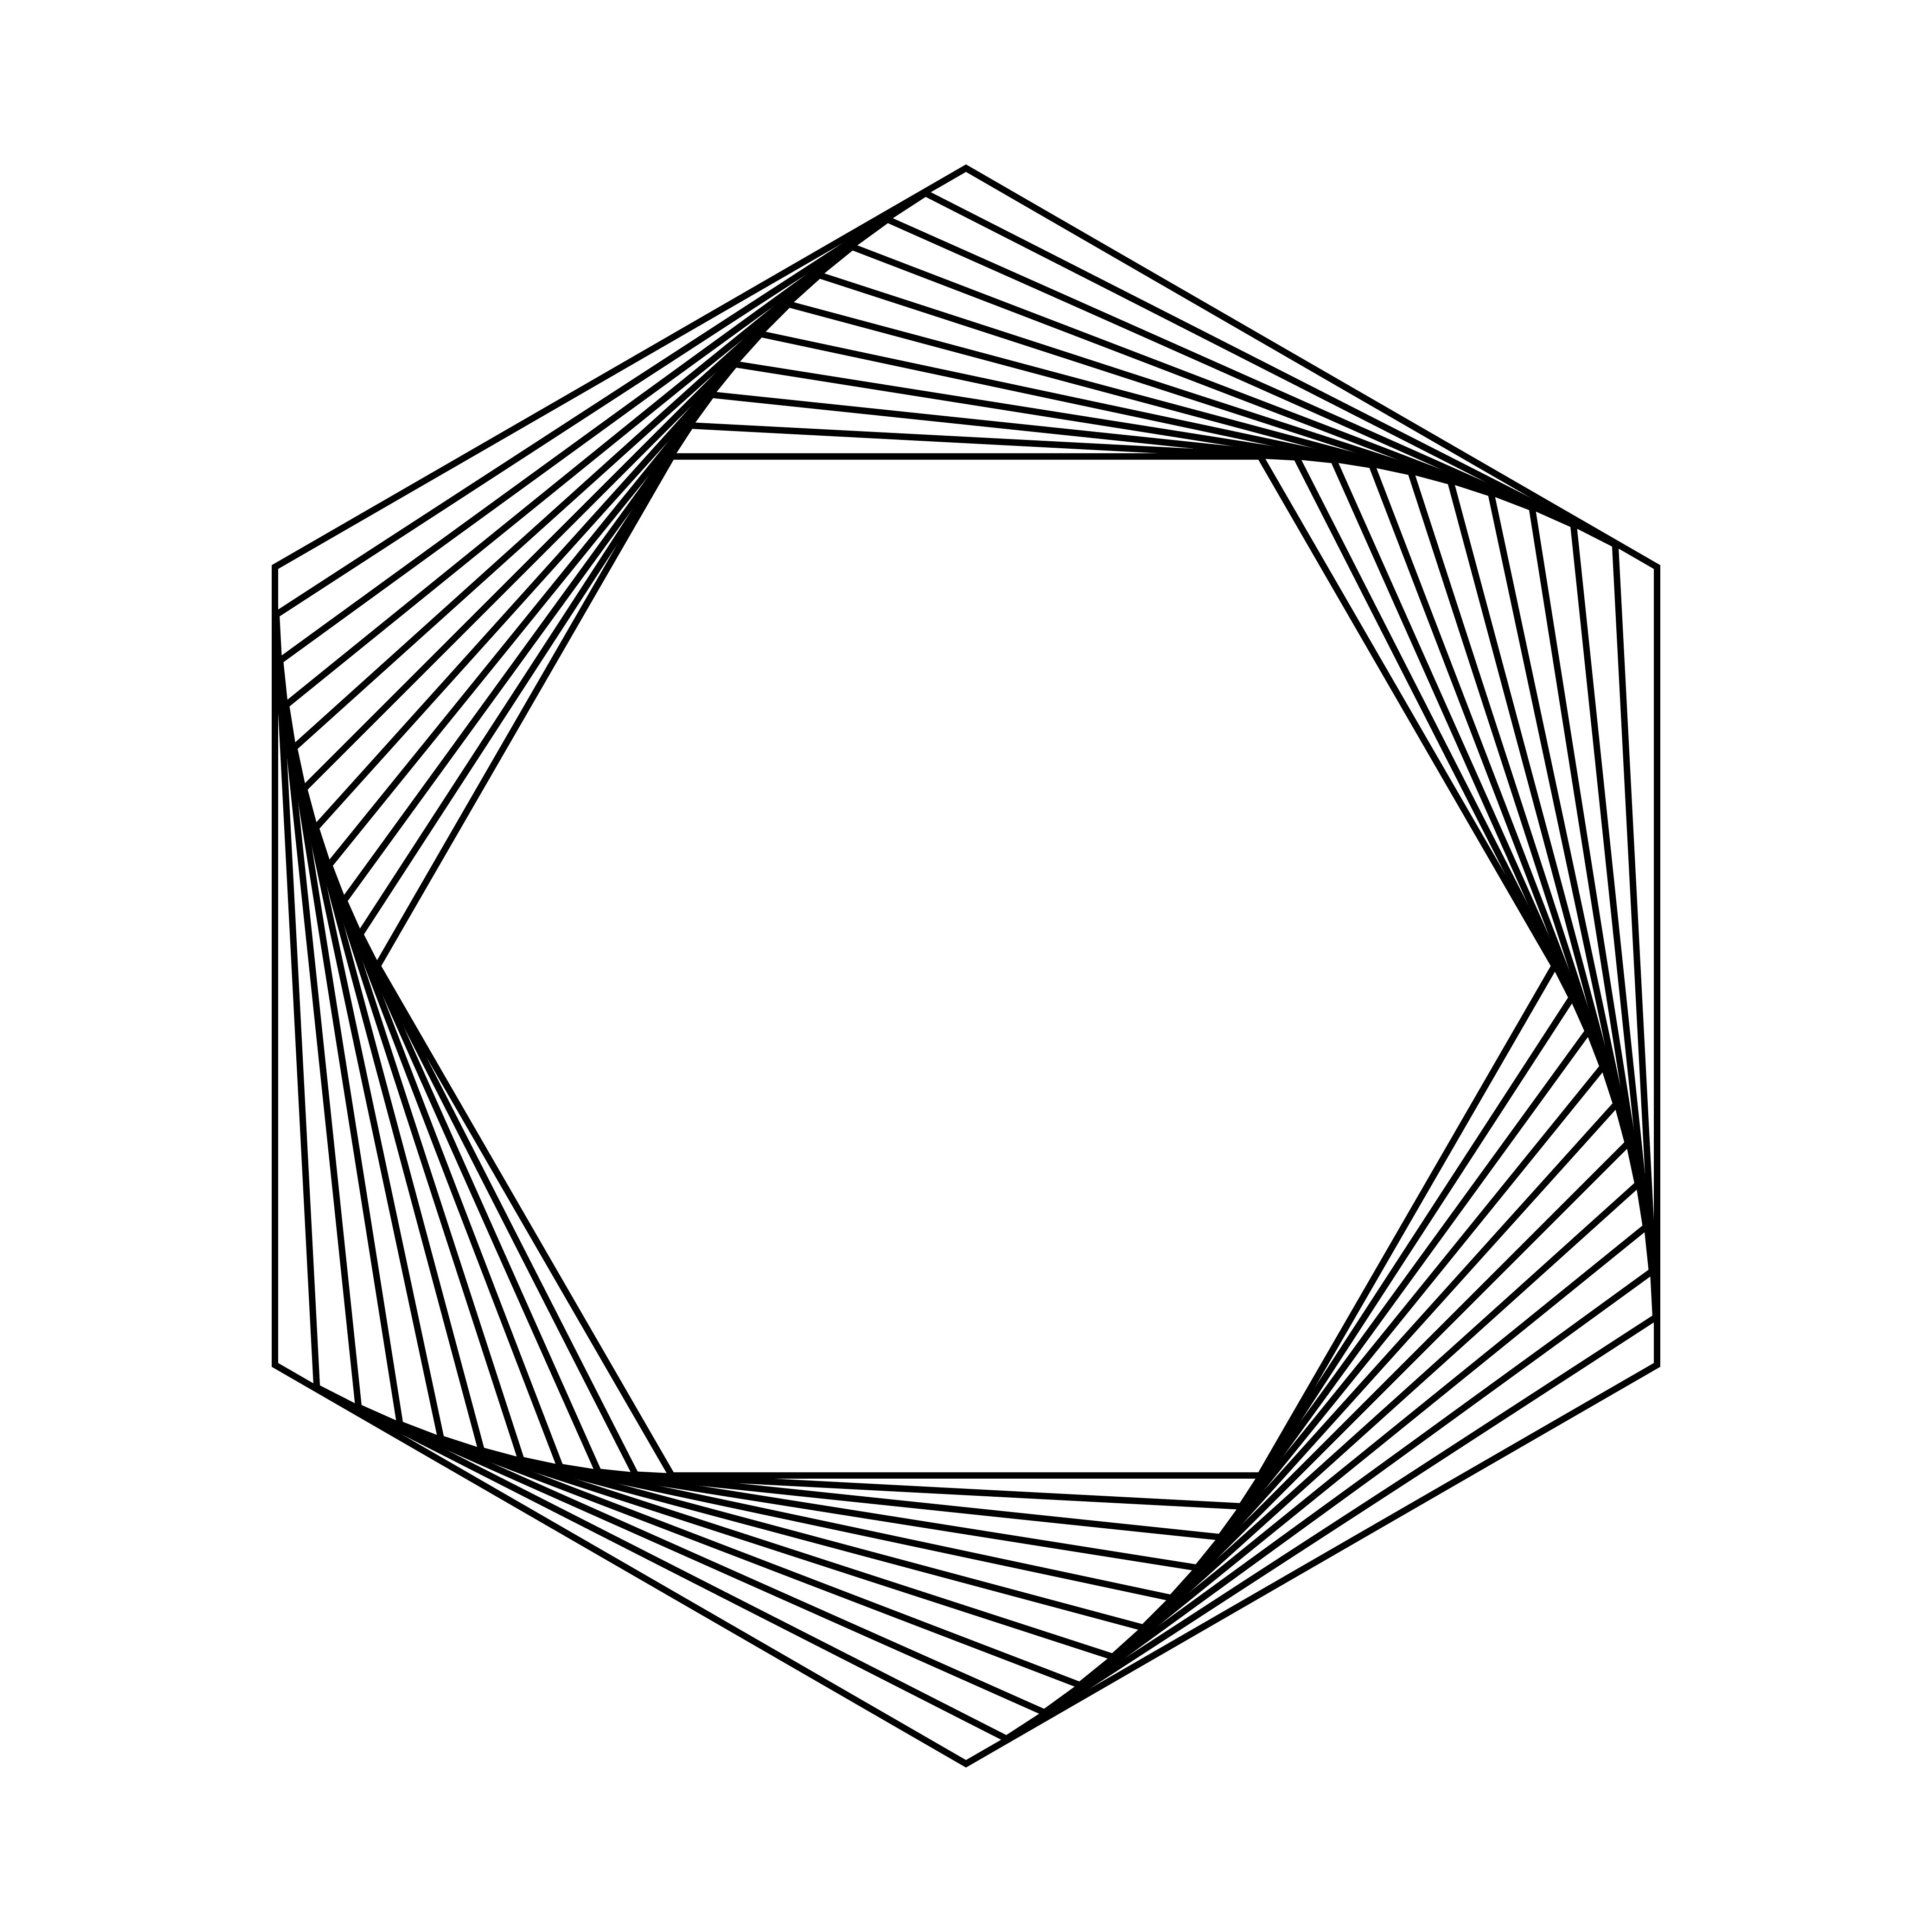 Abstract Hexagon Geometric Element Vector